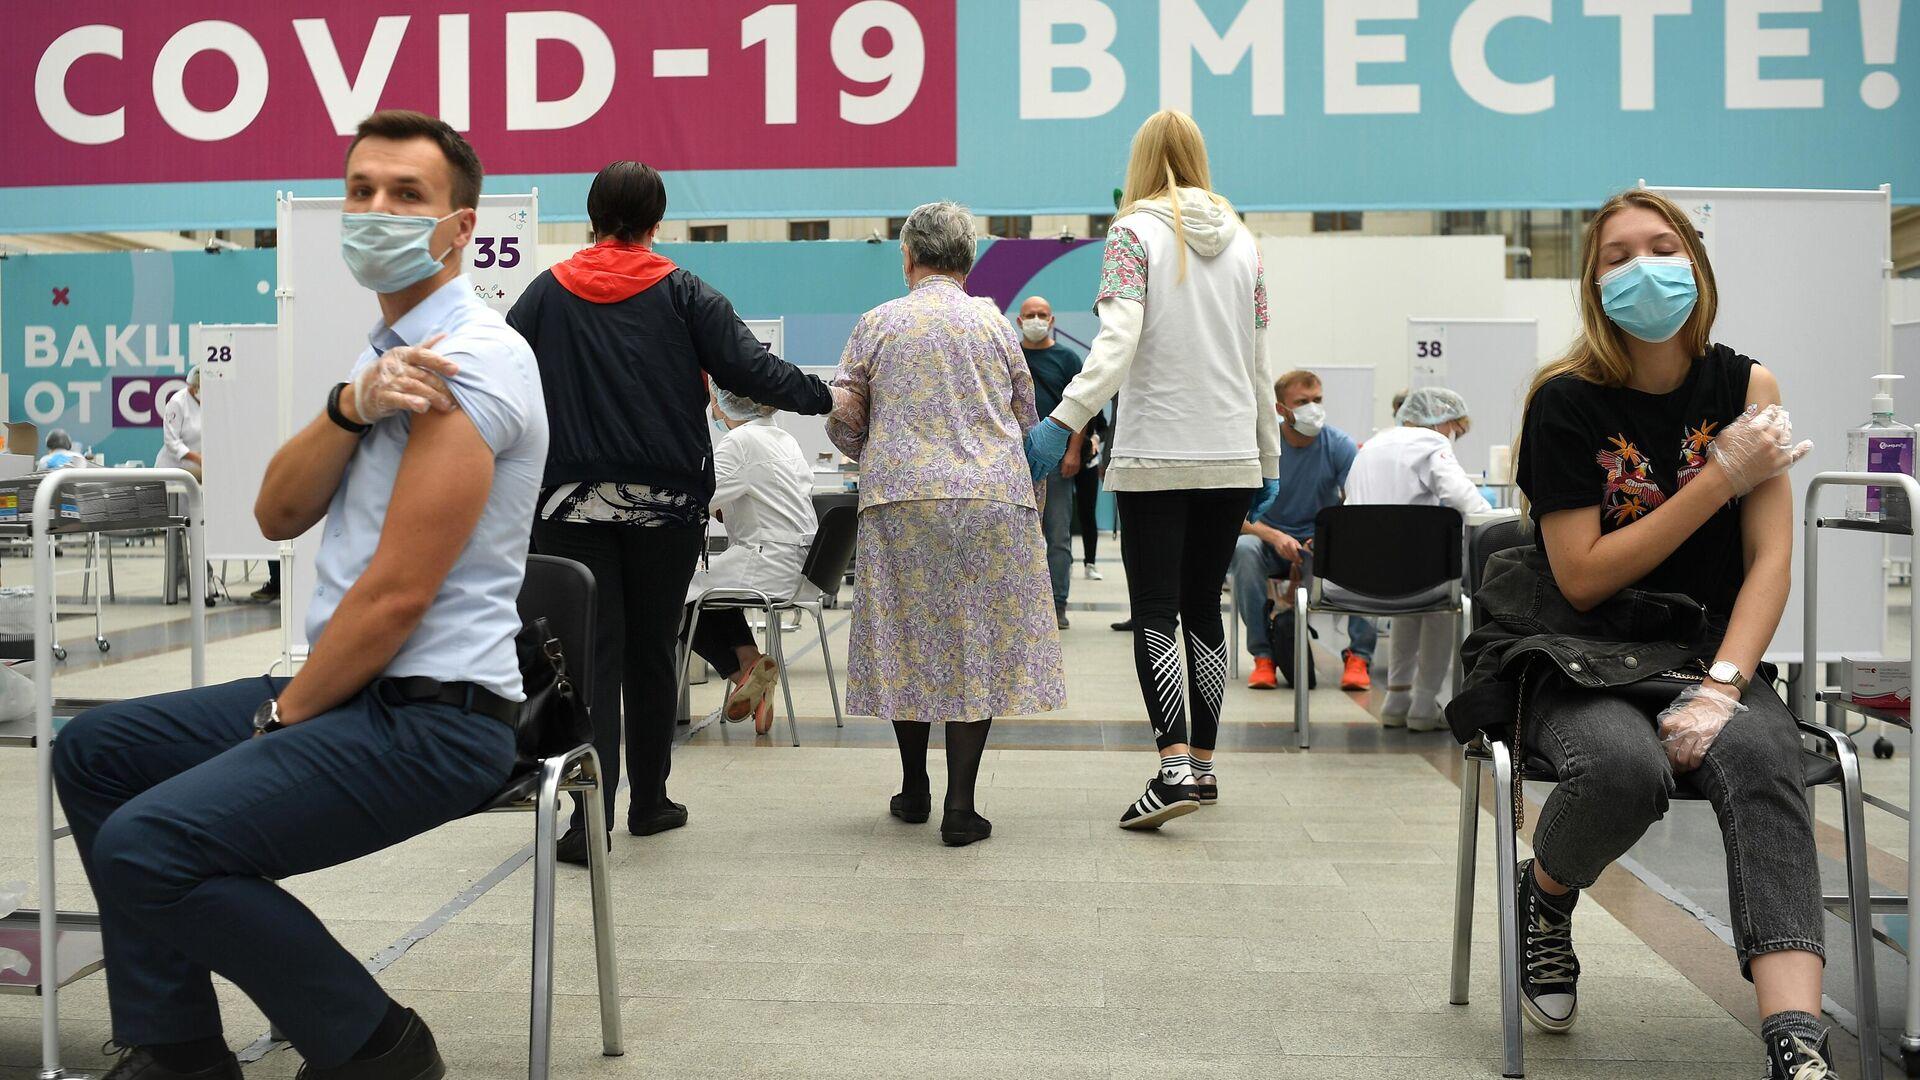 Посетители делают прививки в центре вакцинации от COVID-19 в Гостином дворе в Москве - РИА Новости, 1920, 27.09.2021